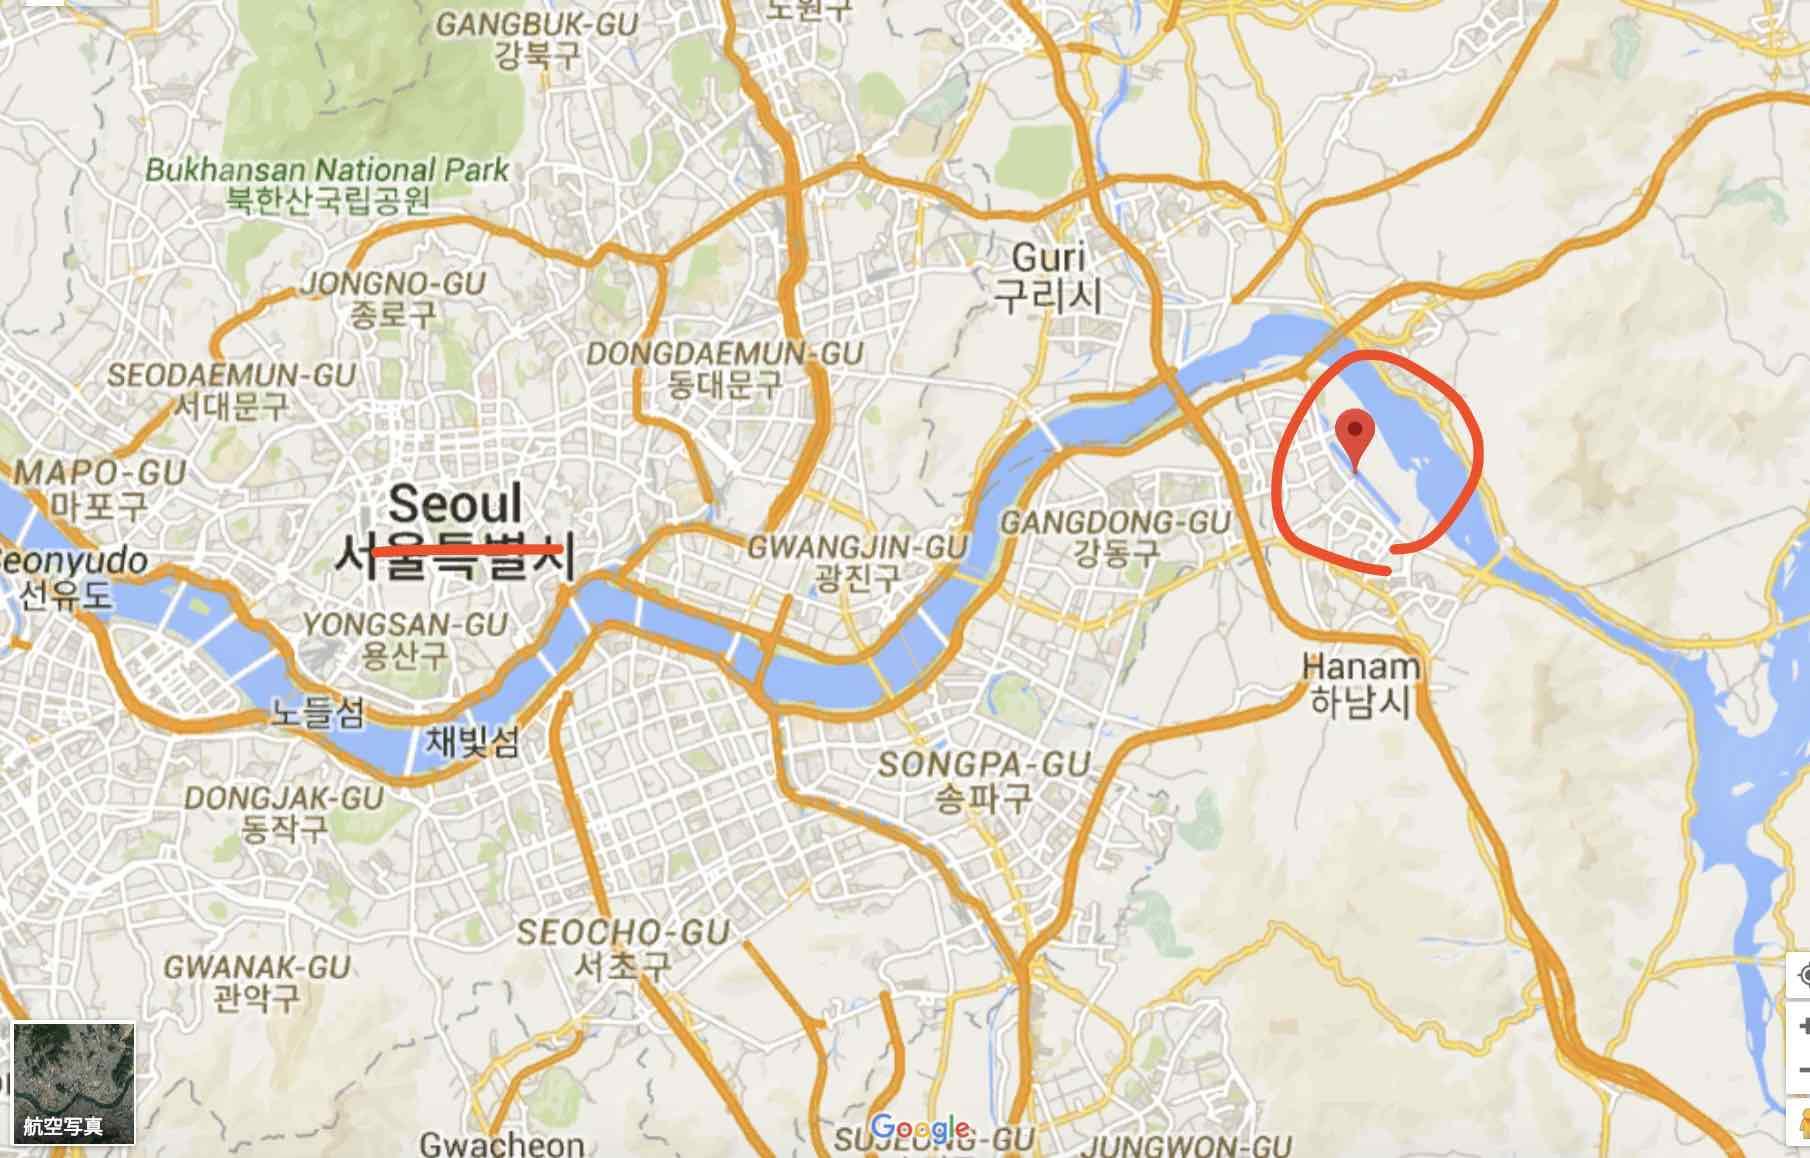 韓国競艇の渼沙里競艇場の場所